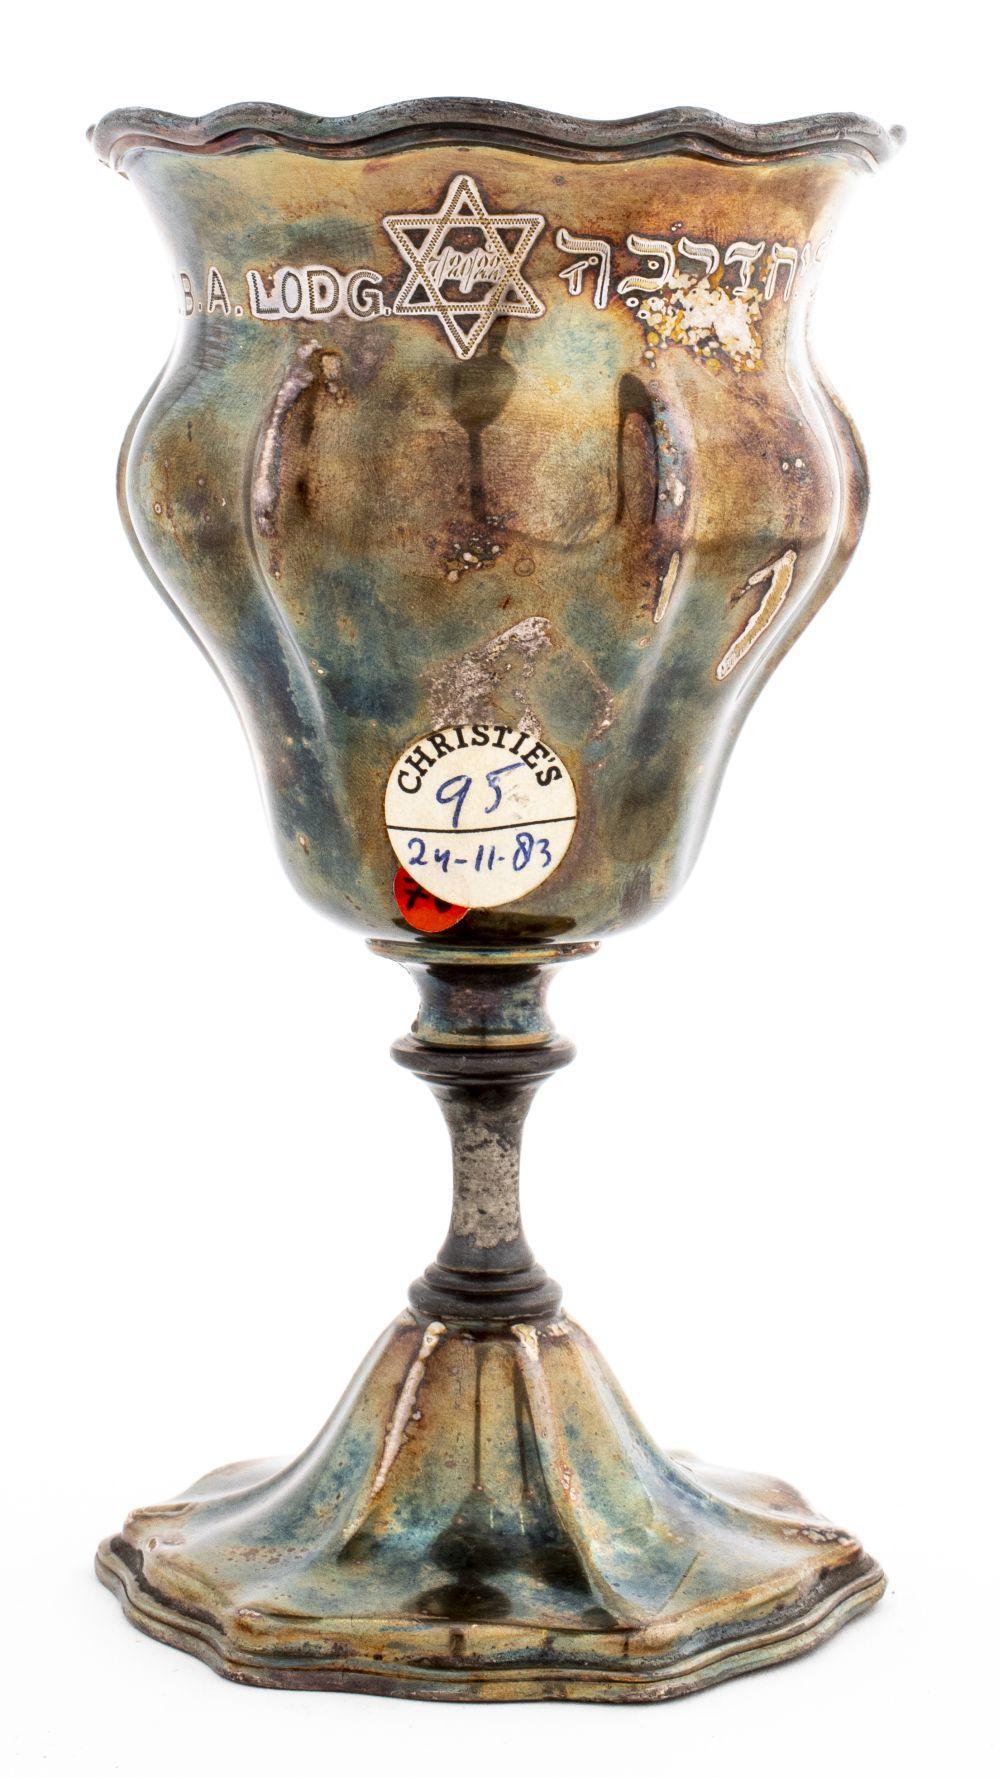 Reed & Barton Judaica Silver-Plate Kiddush Cup